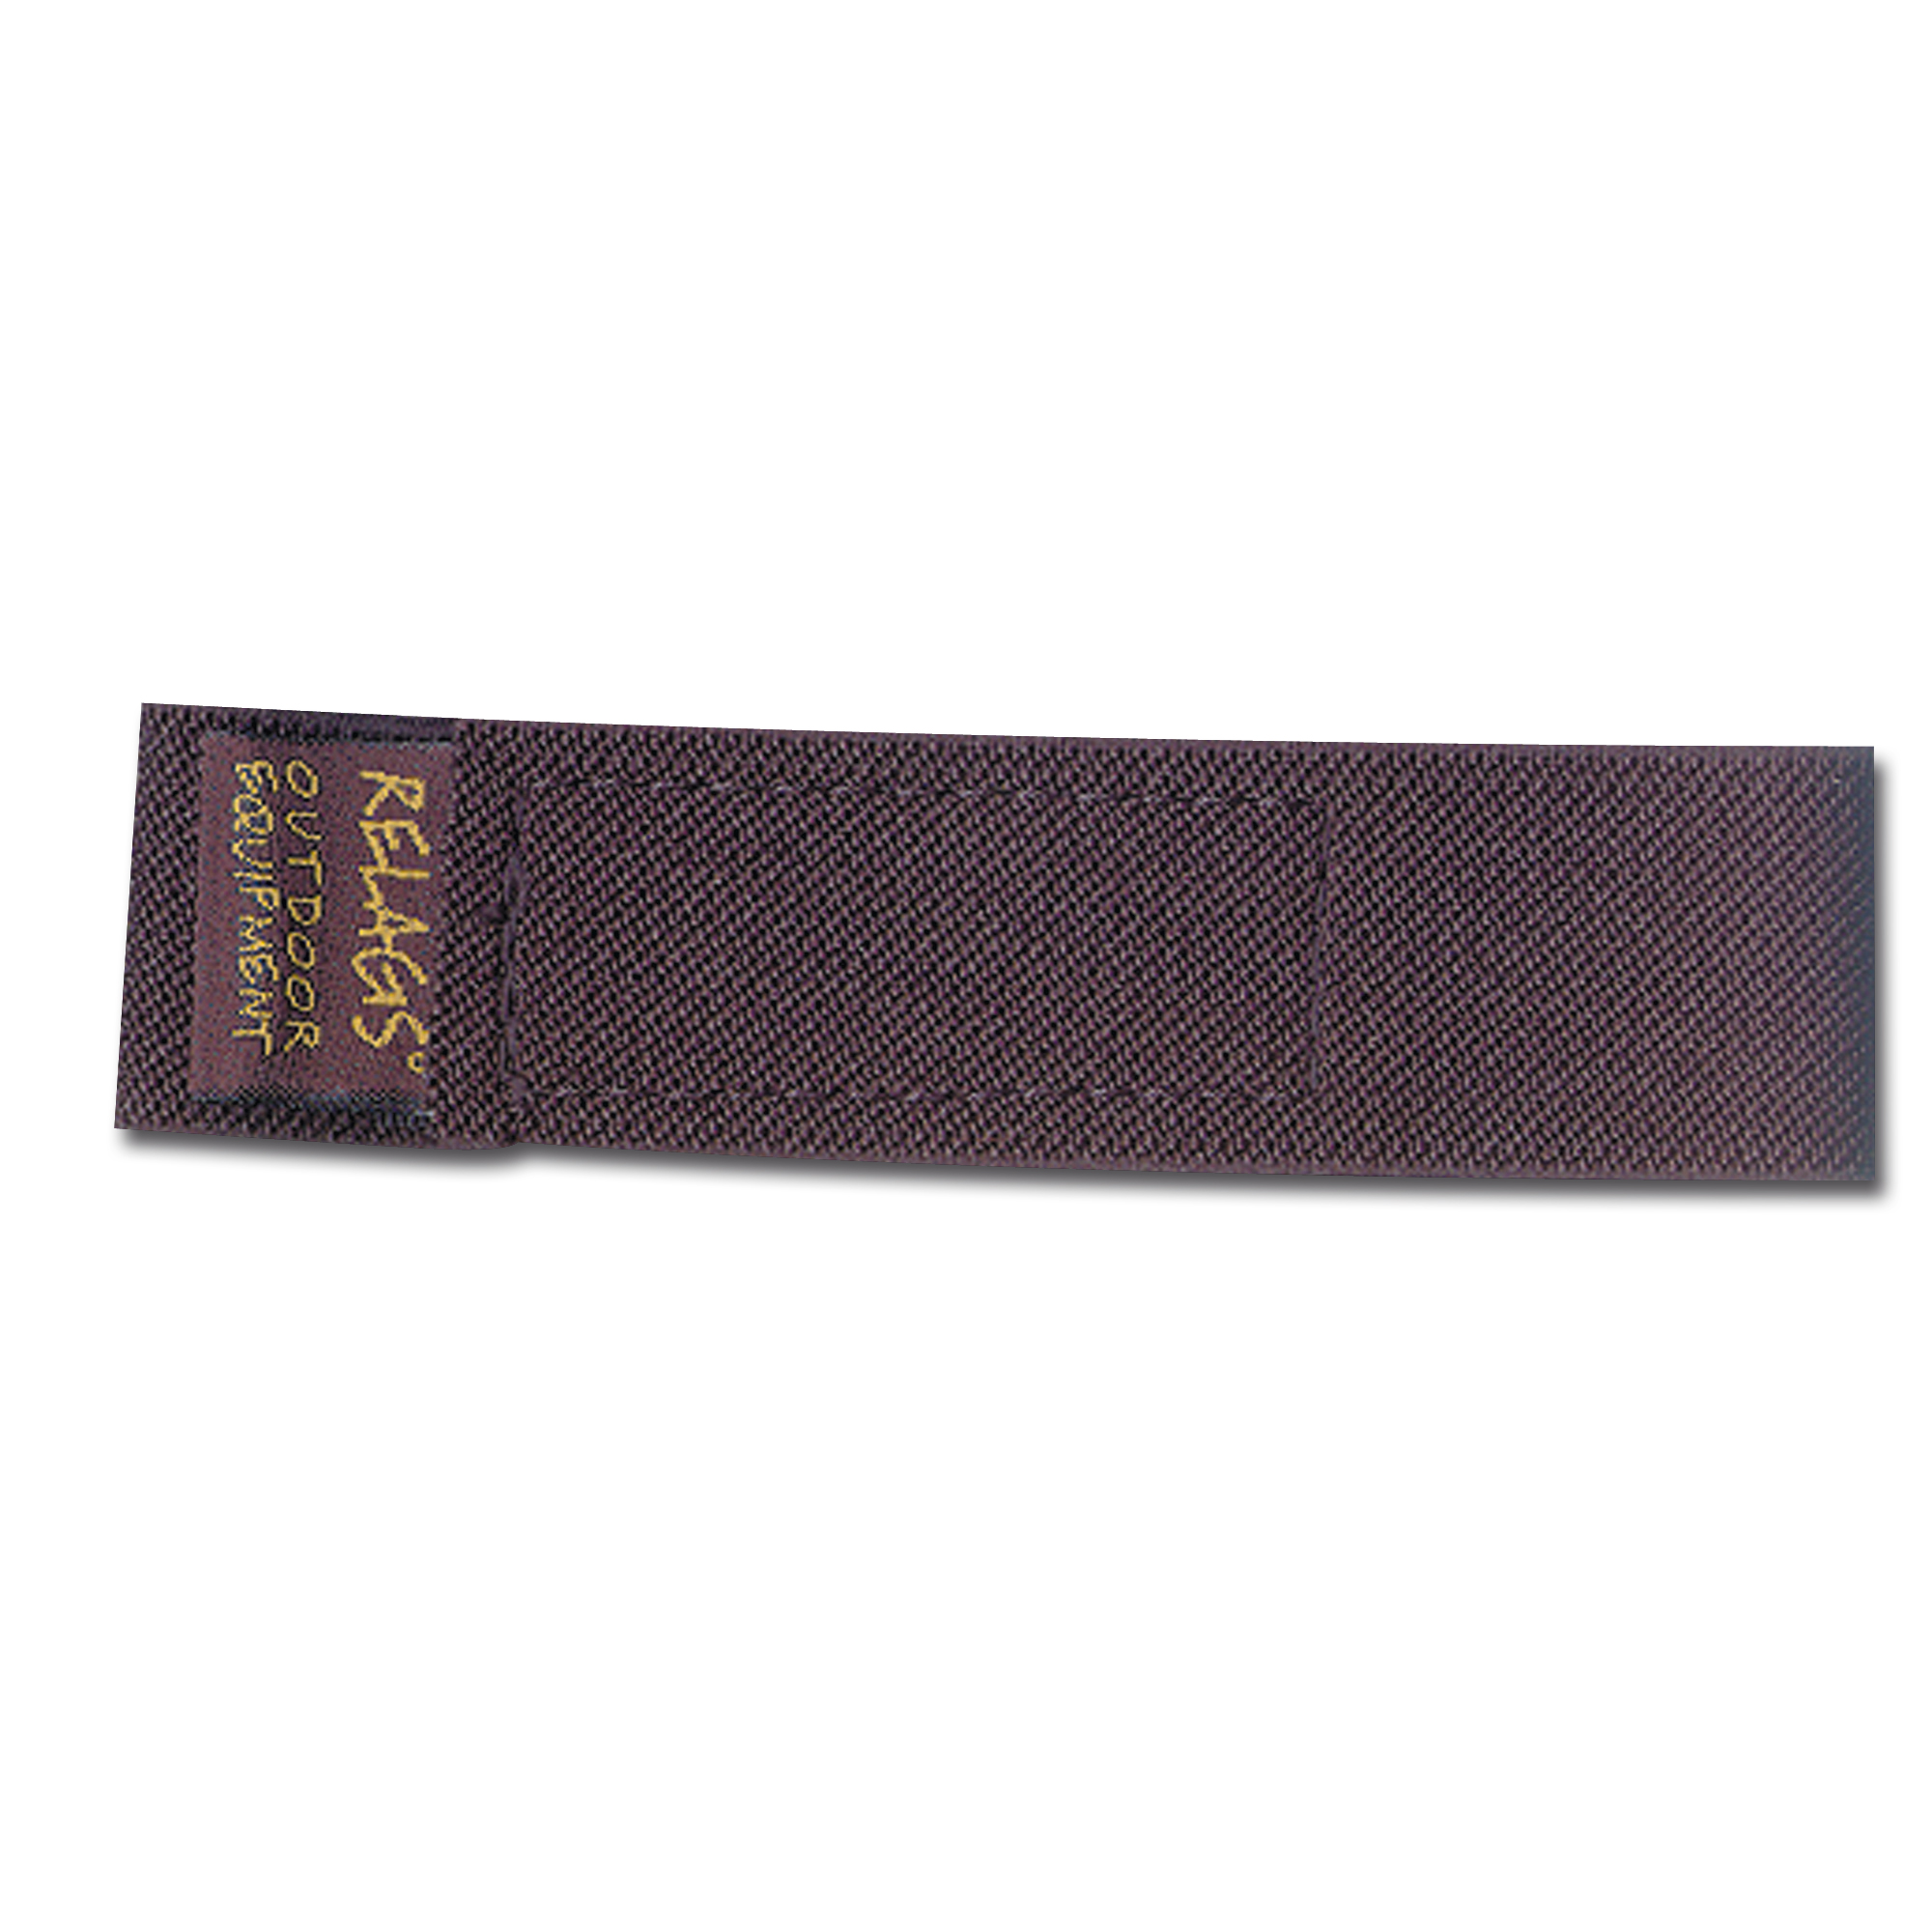 Strapits black 40 cm